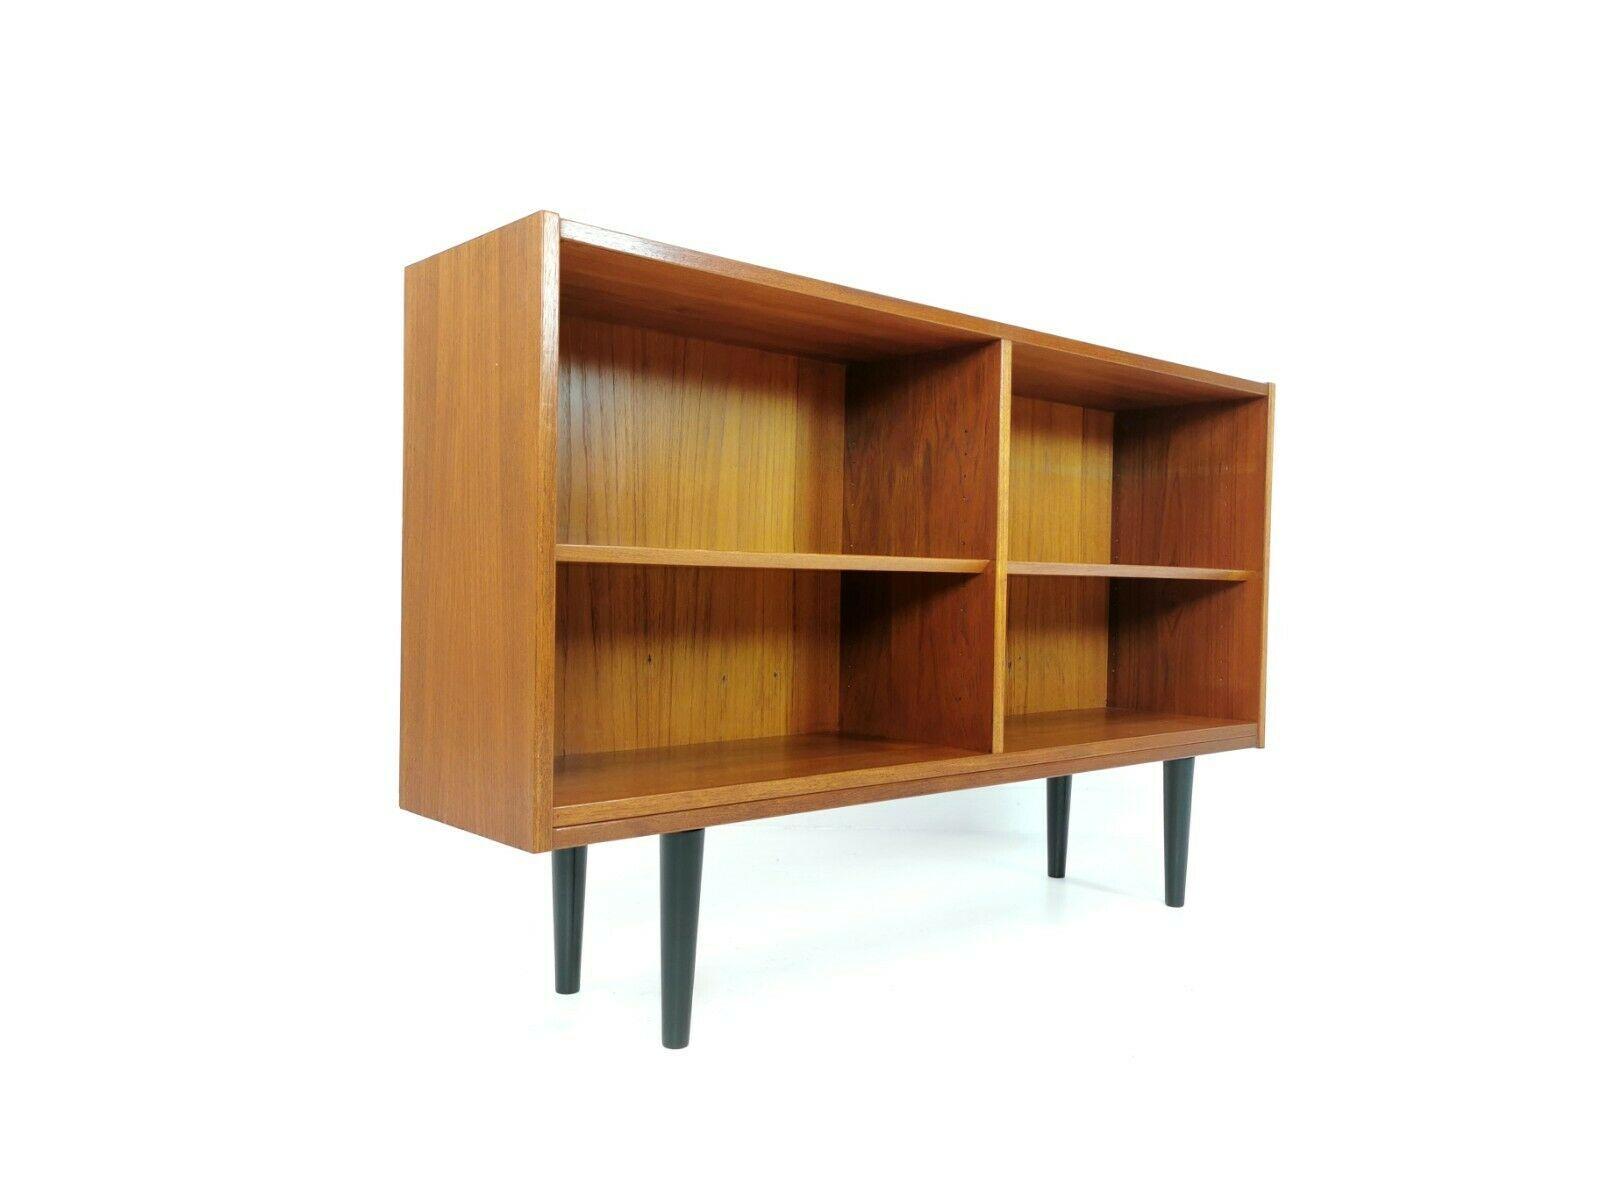 Danish Mid Century Bookcase Cabinet Vintage Retro Unit 1960s 70s